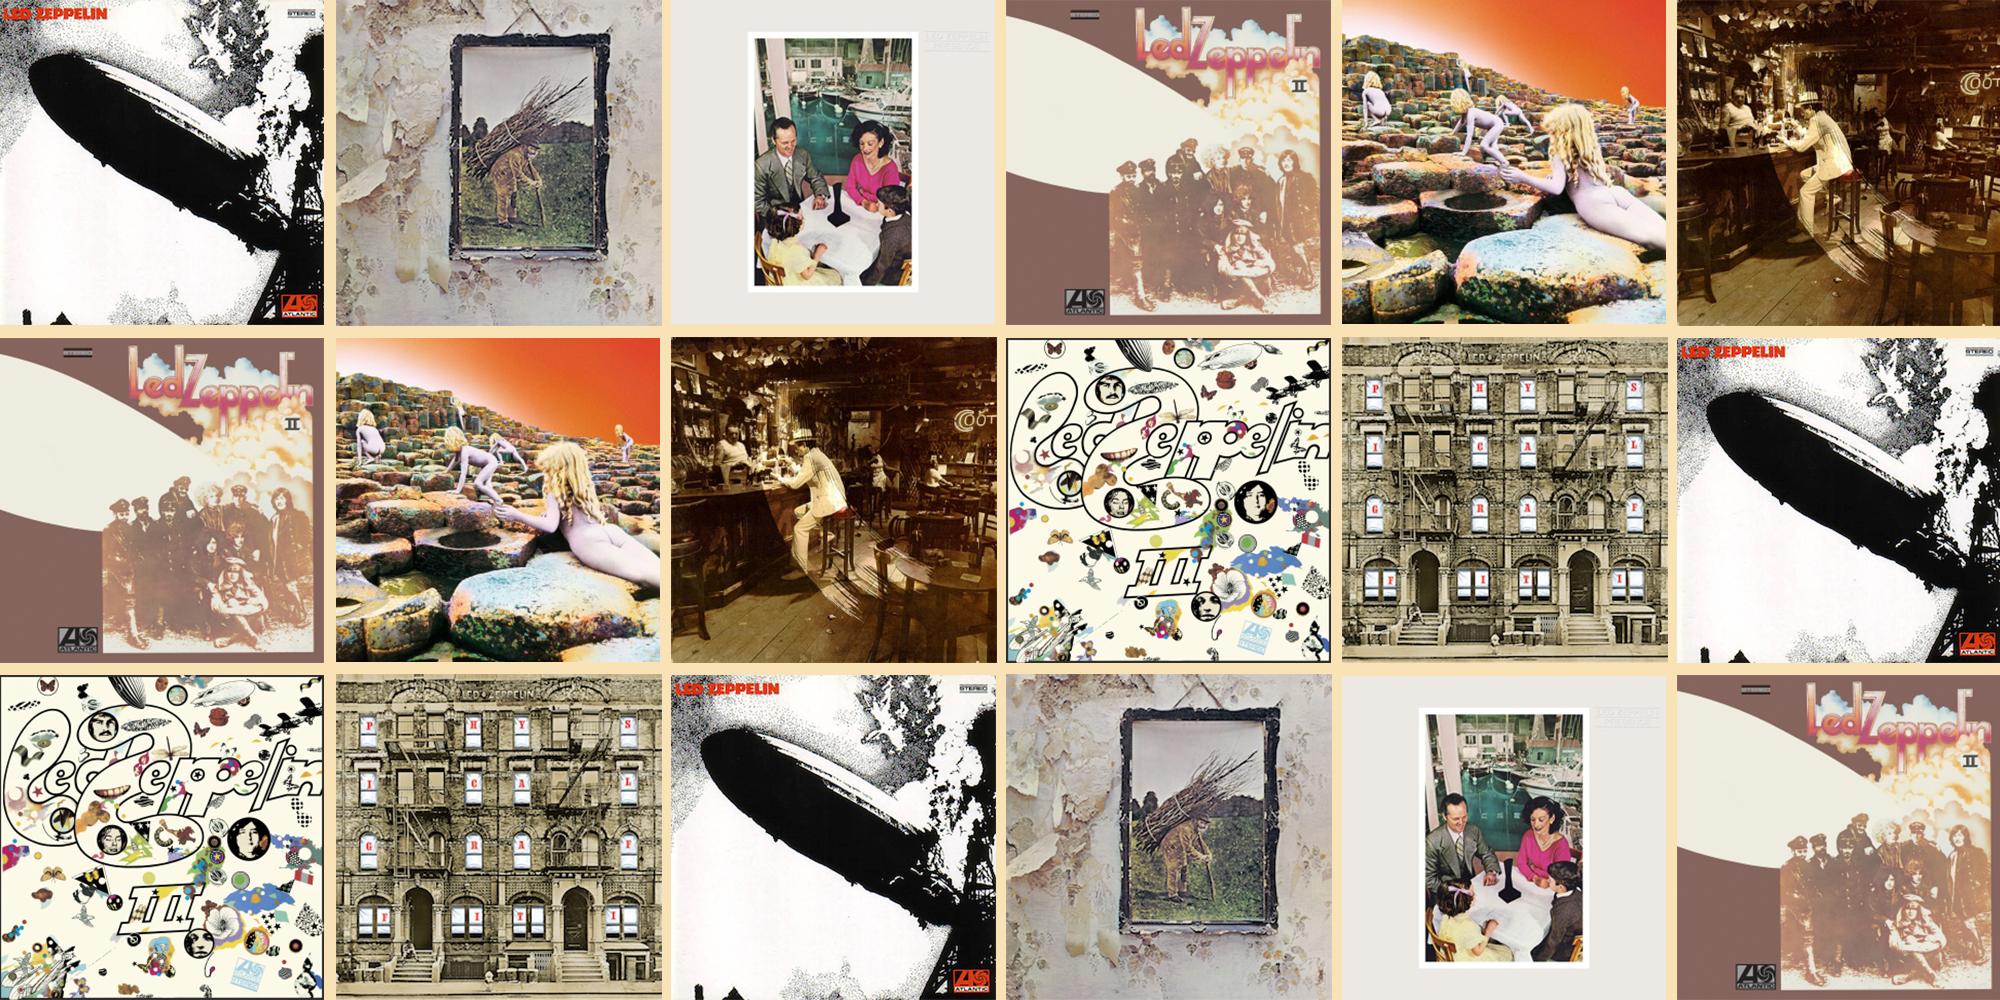 All Led Zeppelin Albums Ranked - The Best Led Zeppelin